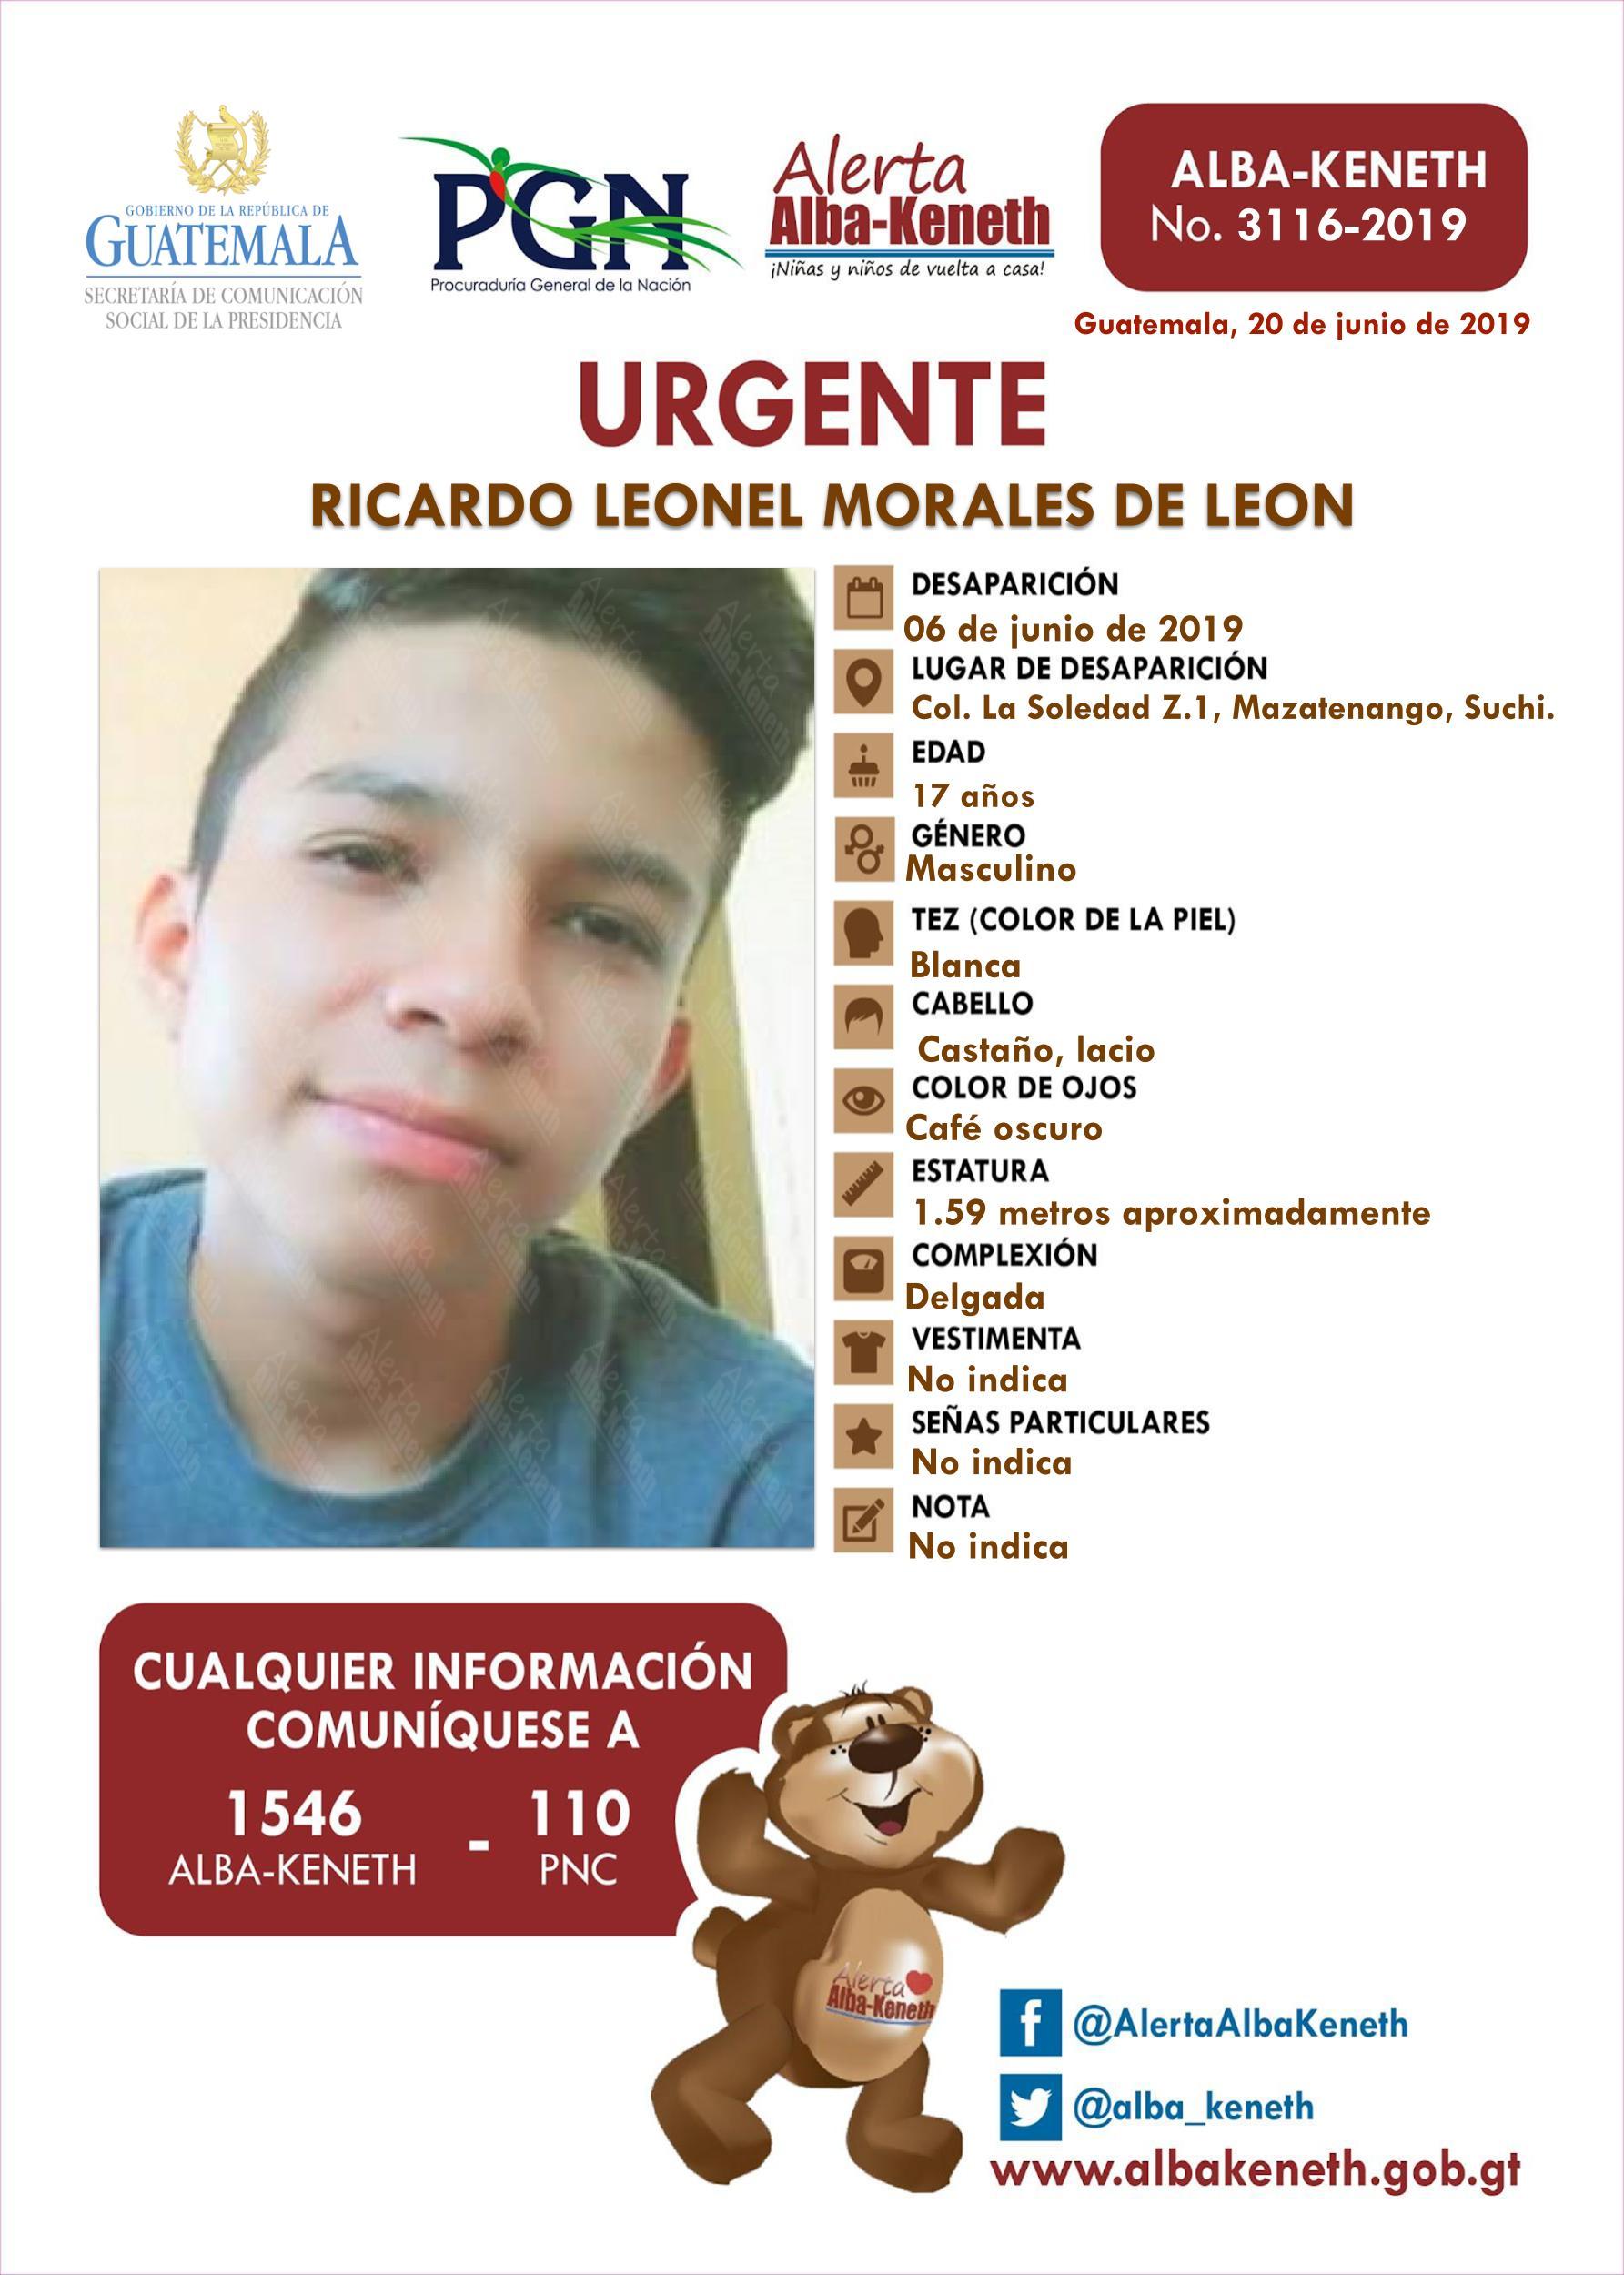 Ricardo Leonel Morales de Leon